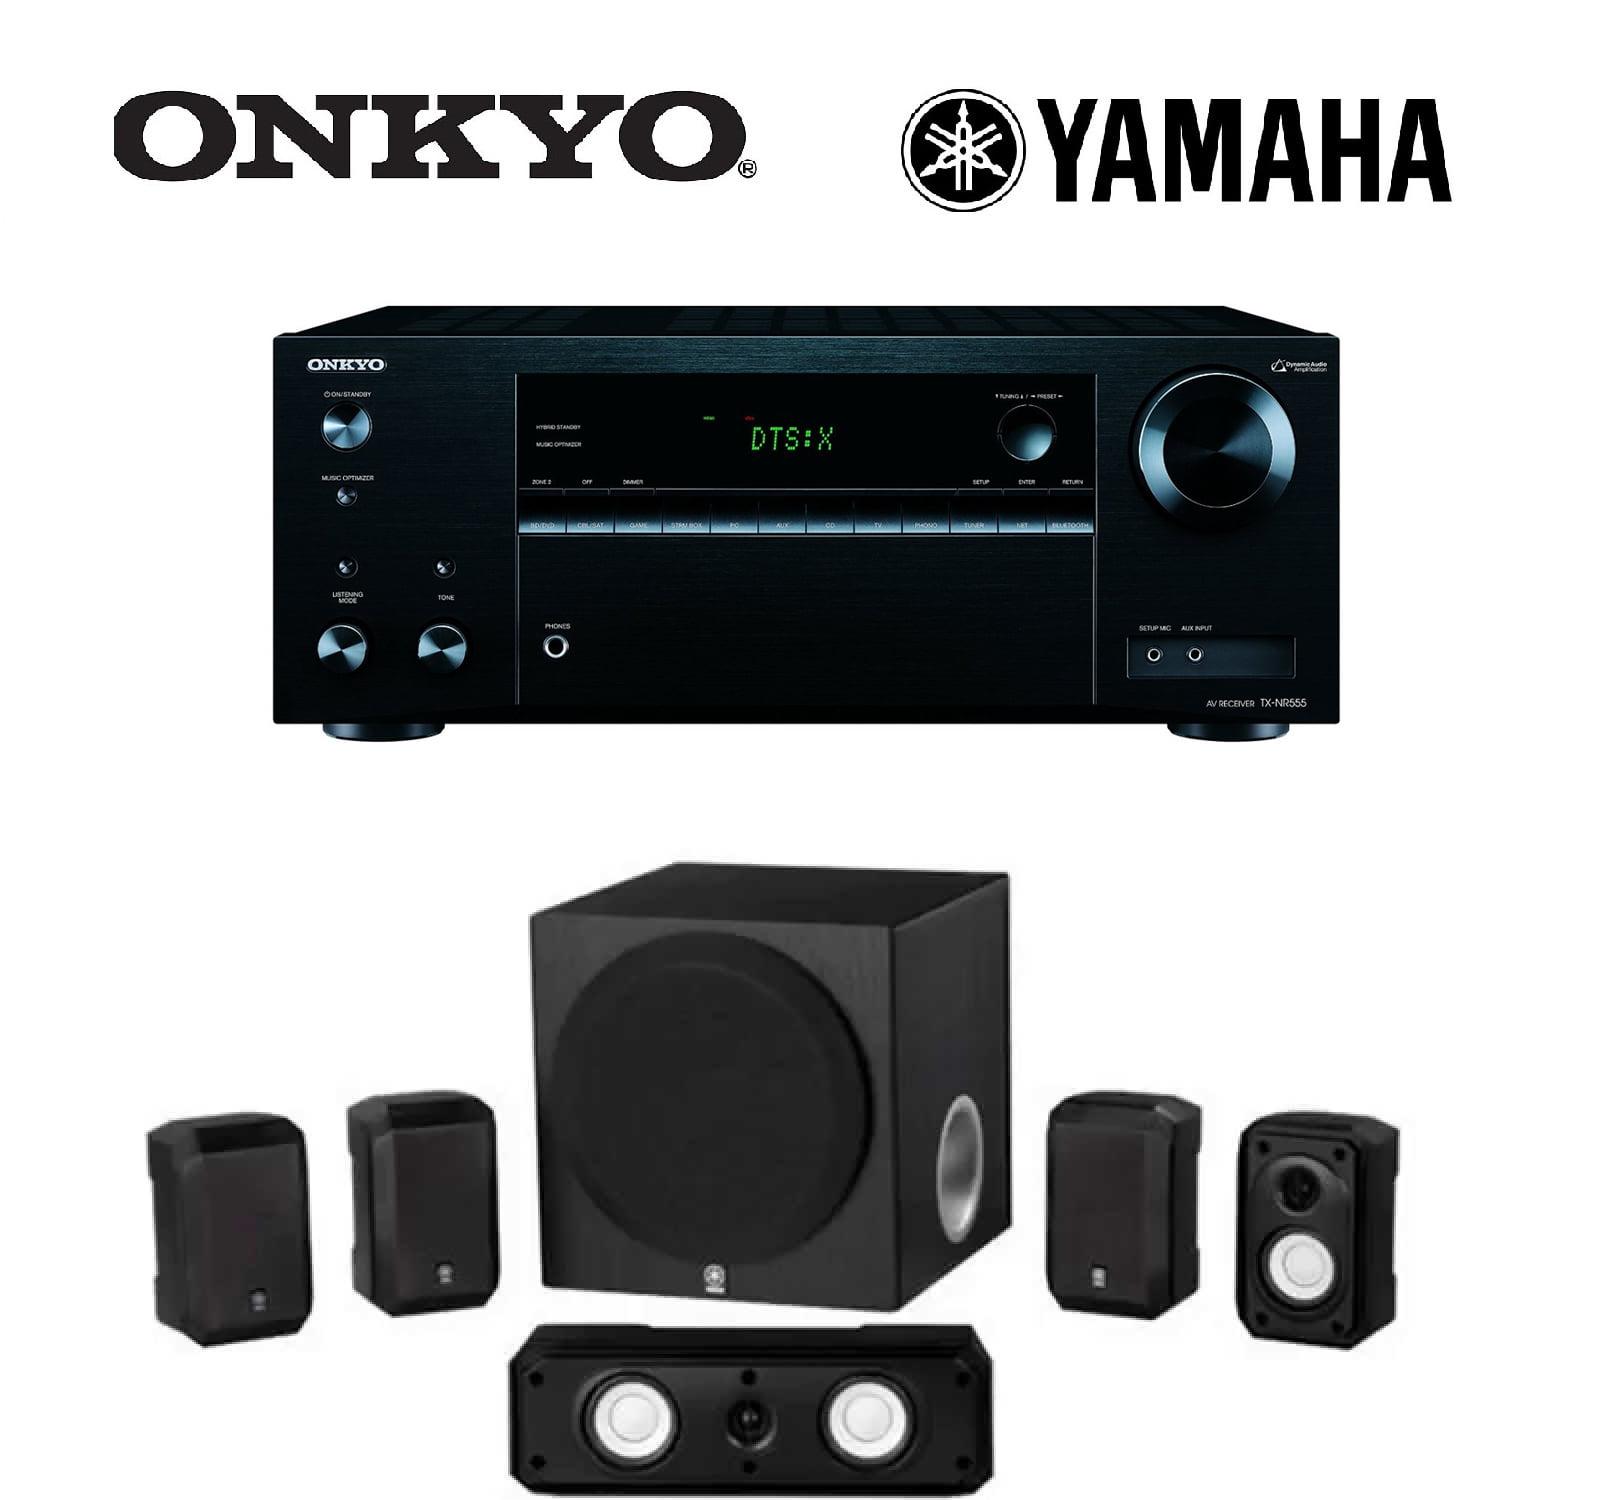 Onkyo TX-NR555 7.2-Channel Network A/V Receiver + Yamaha NS-SP1800BL 5.1-Channel Home Theater Speaker Set Bundle